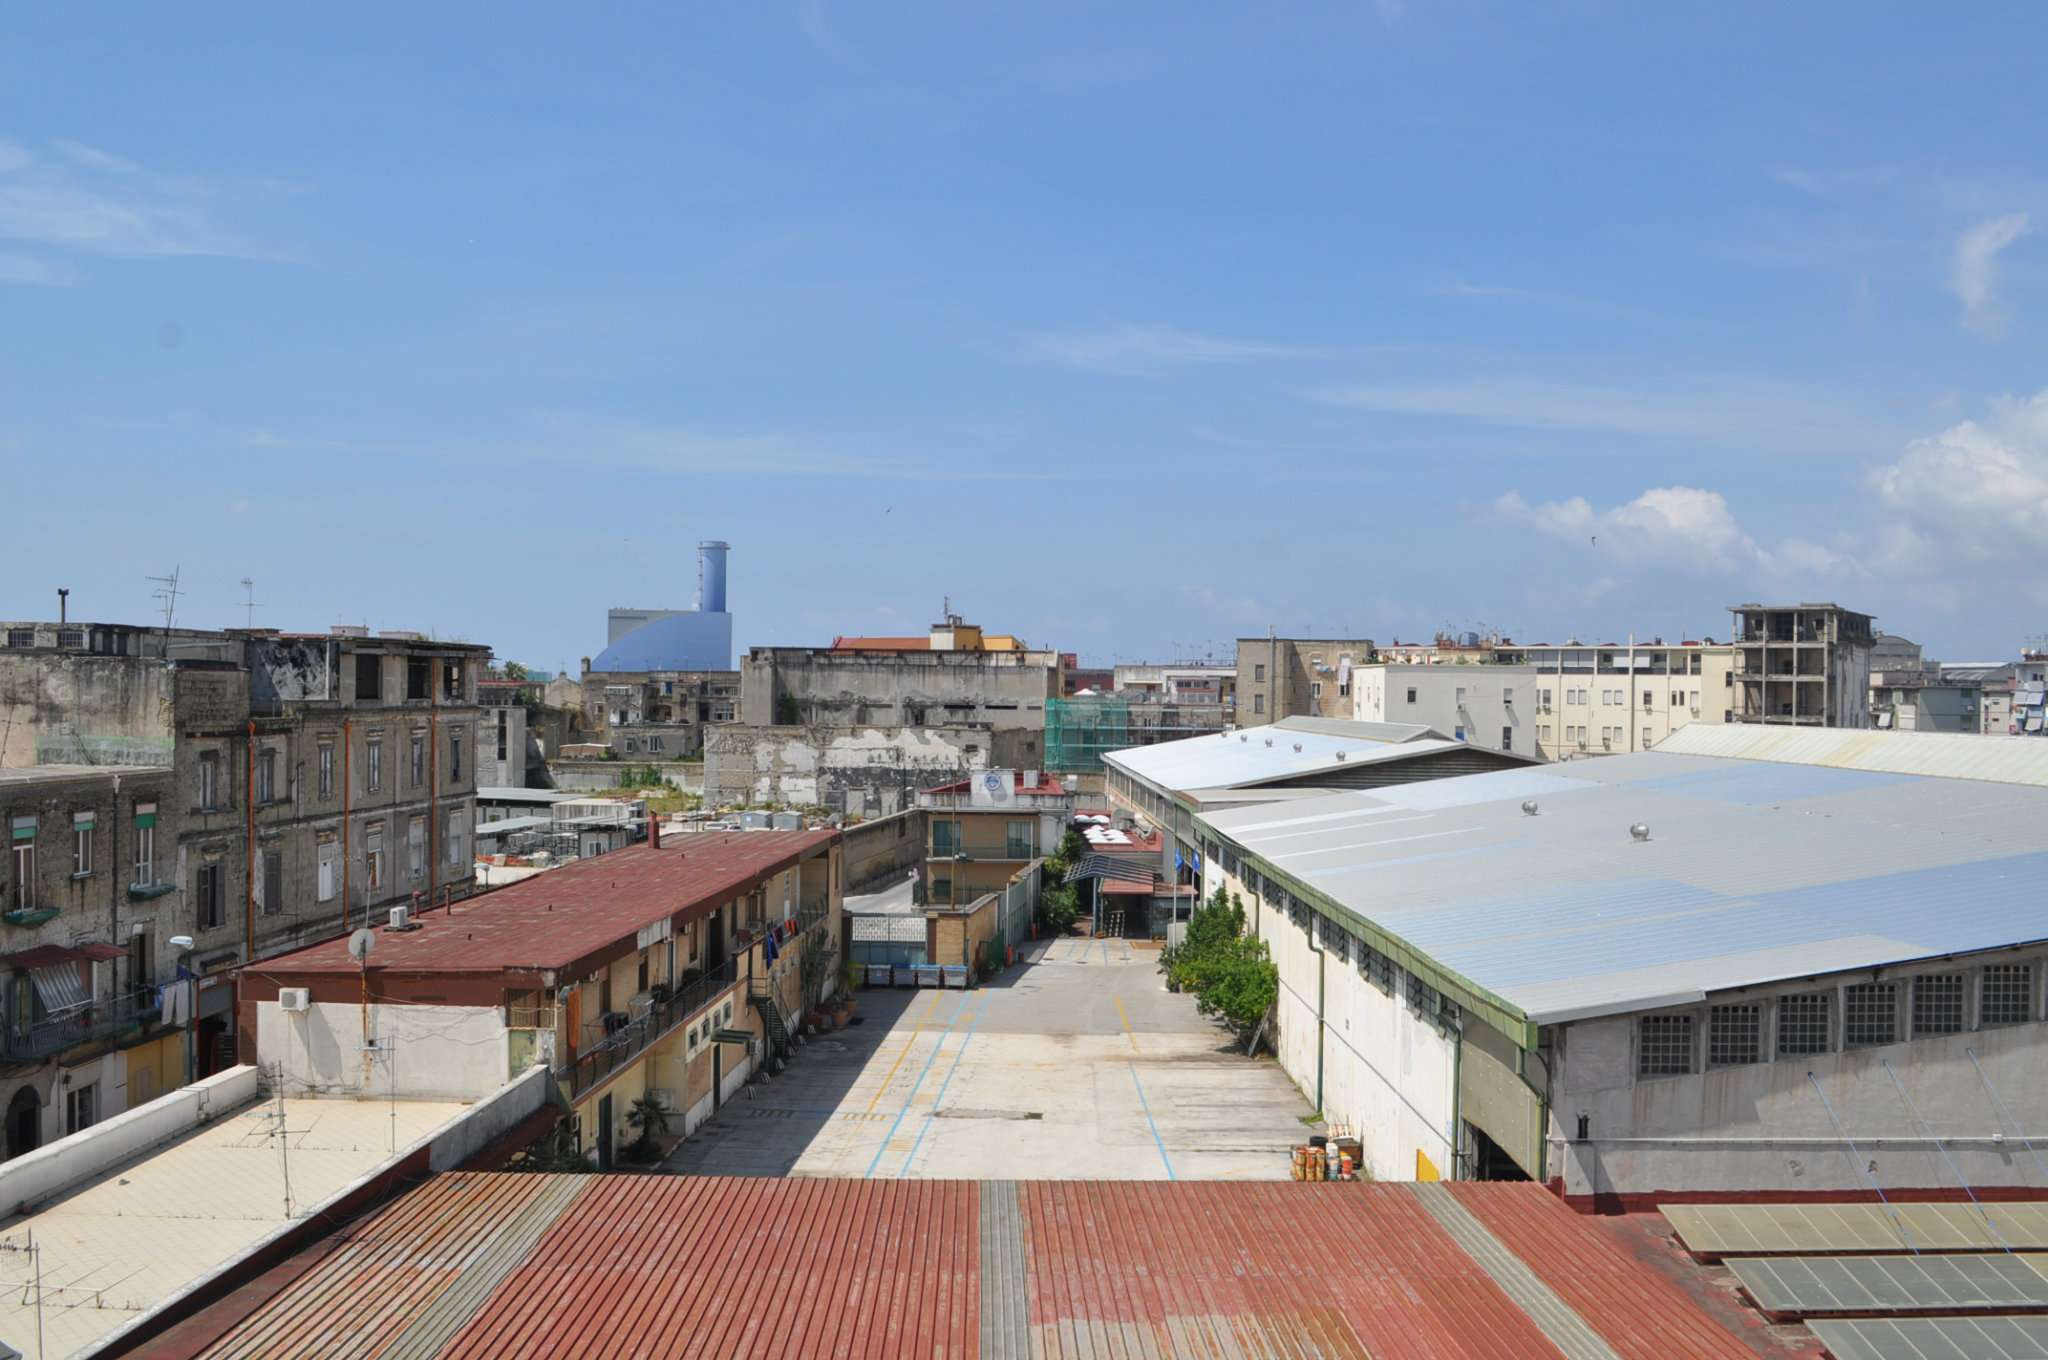 Bilocale Napoli Via Sorrento 1